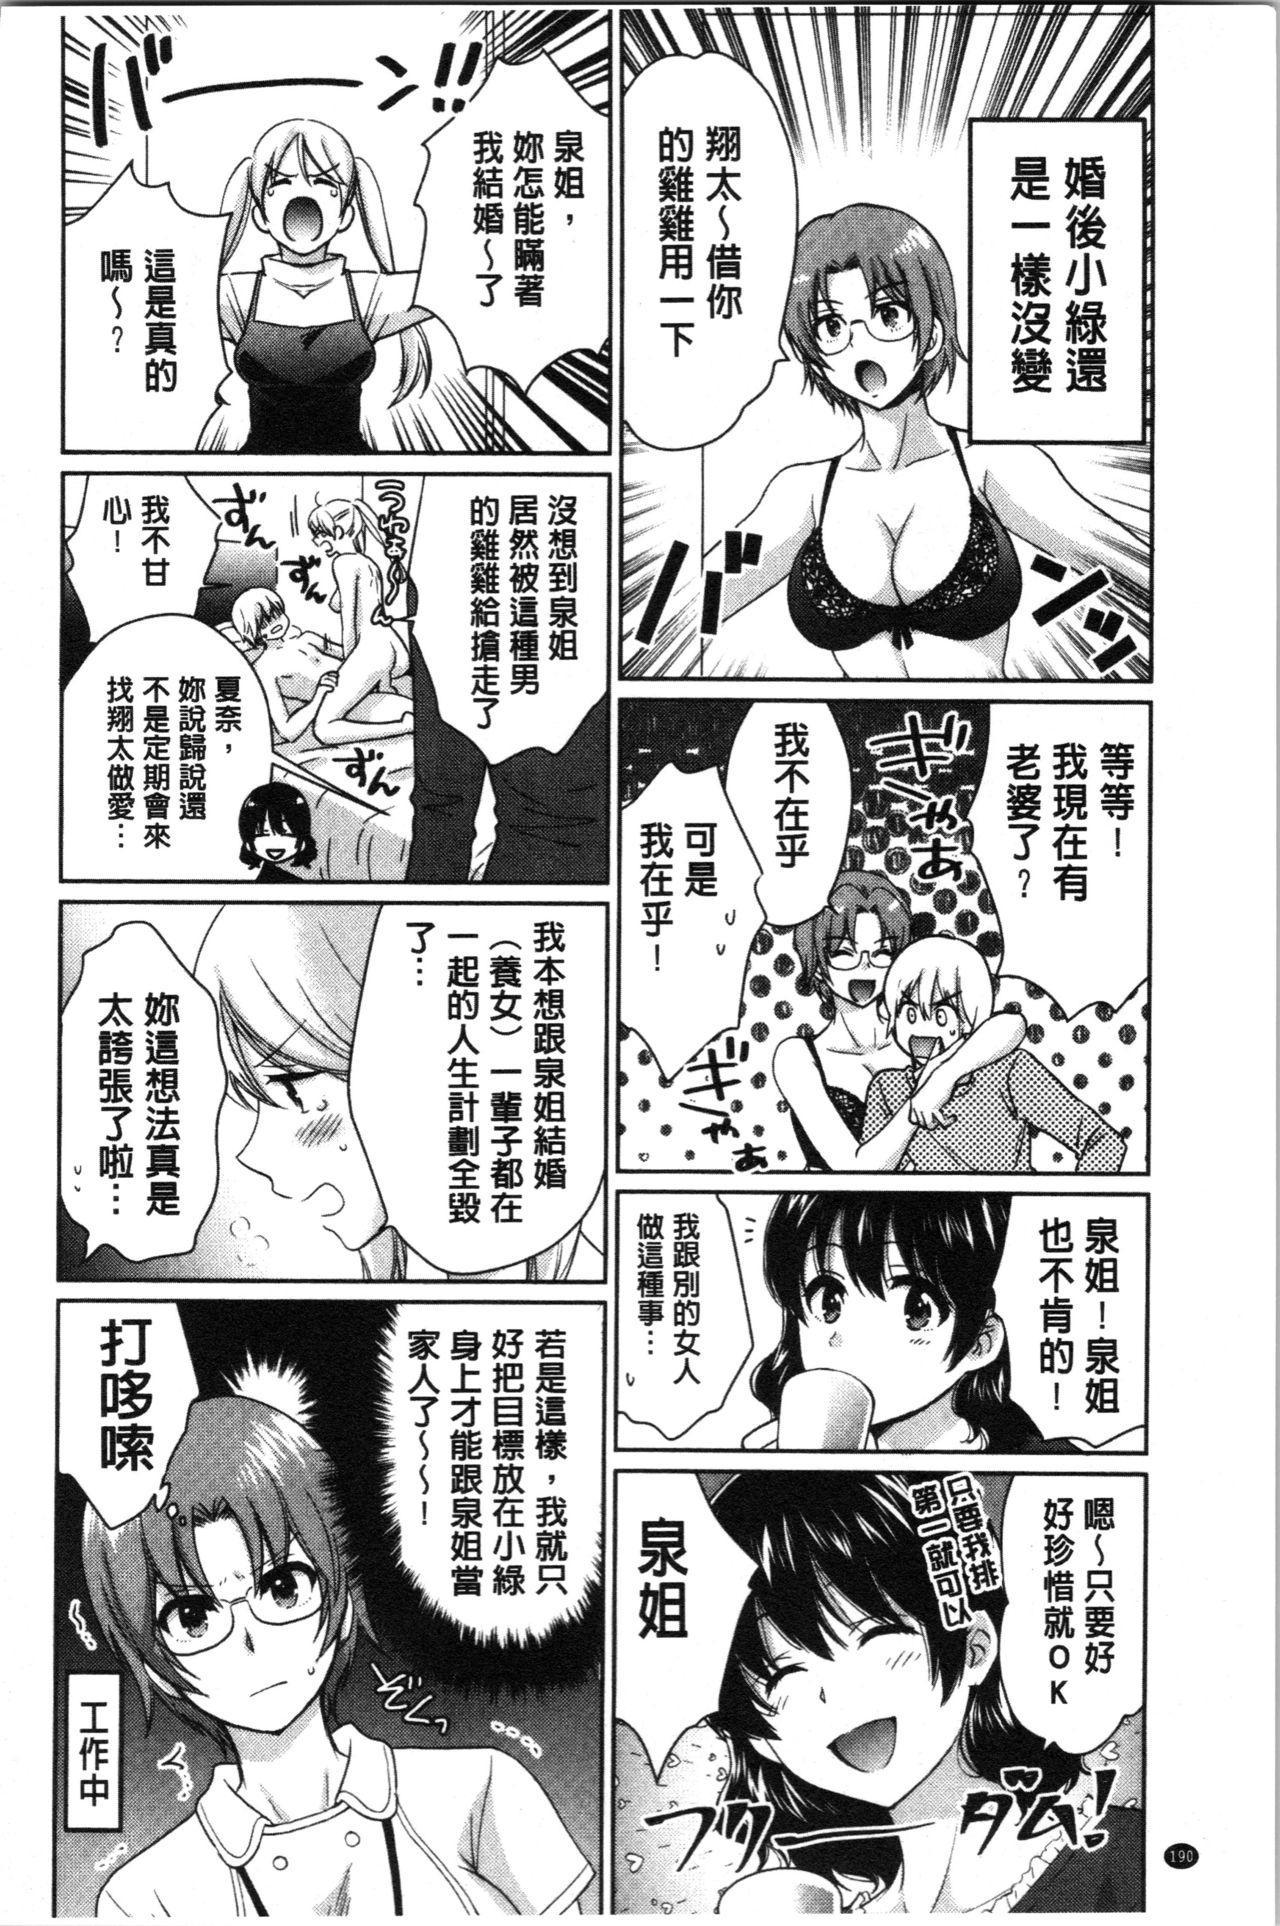 Ottori Midarana Mikami-san   嫻淑優雅又淫亂的三上小姐 191